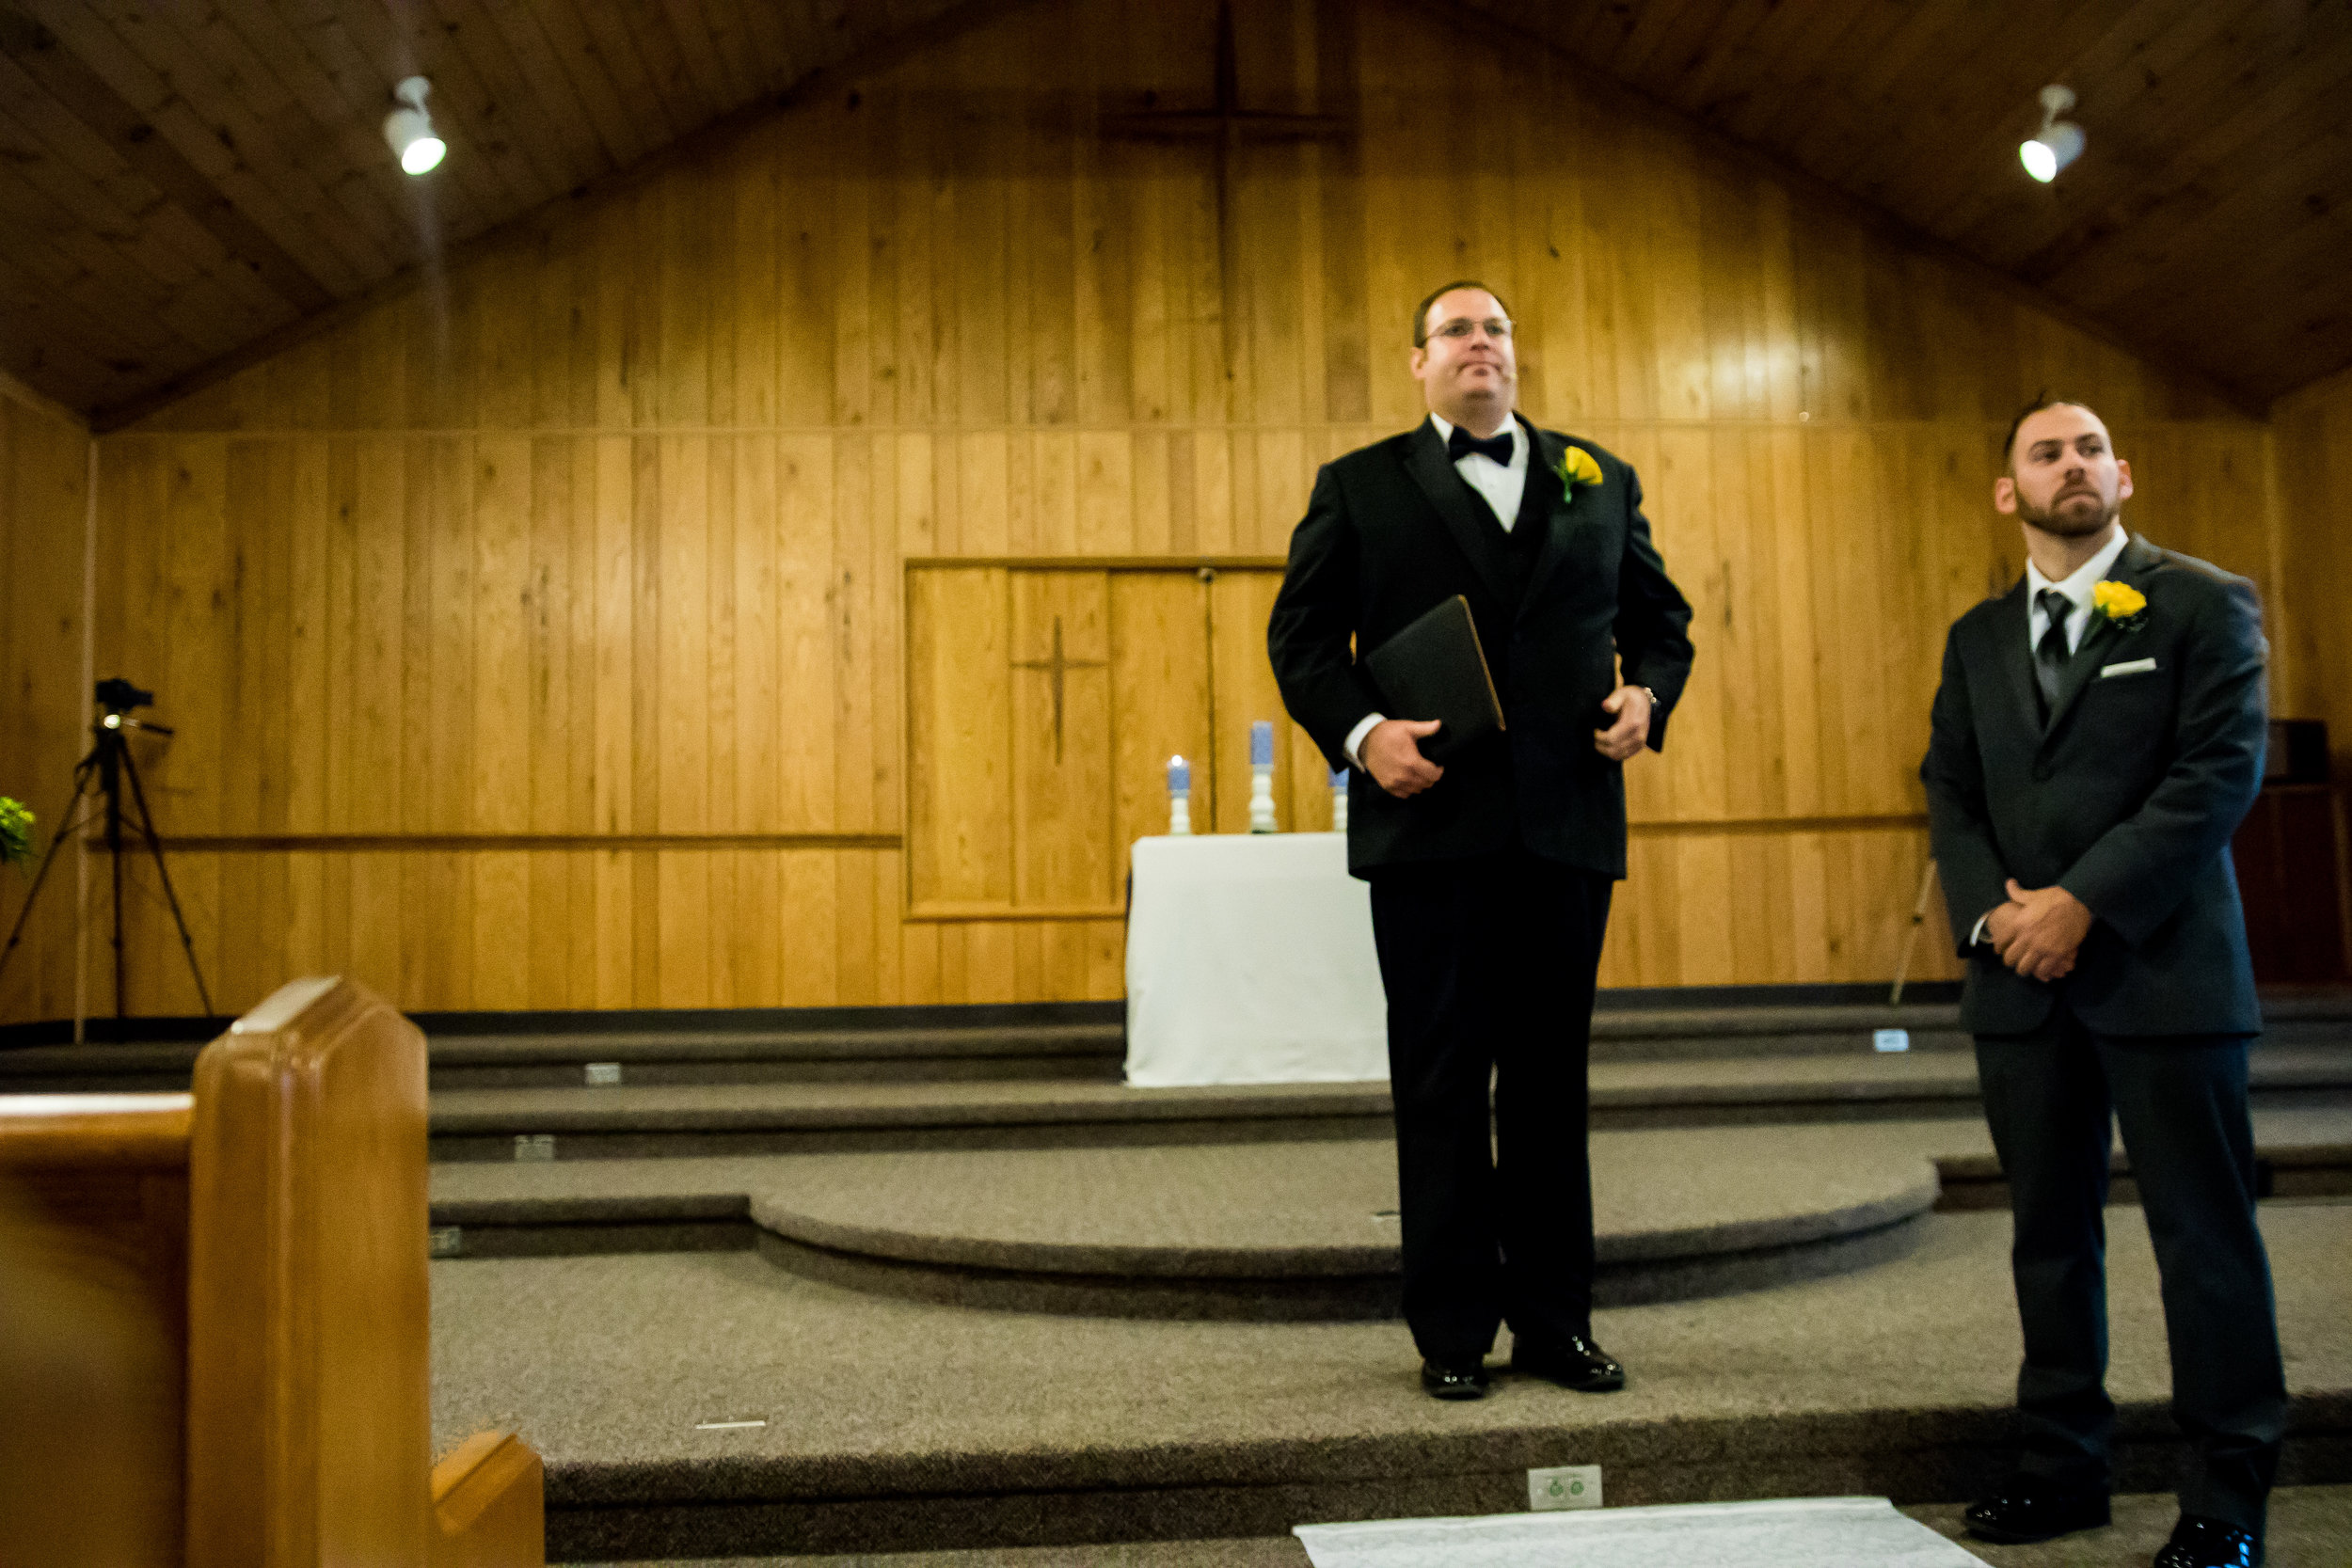 Wedding_Photography_Ward-659.jpg